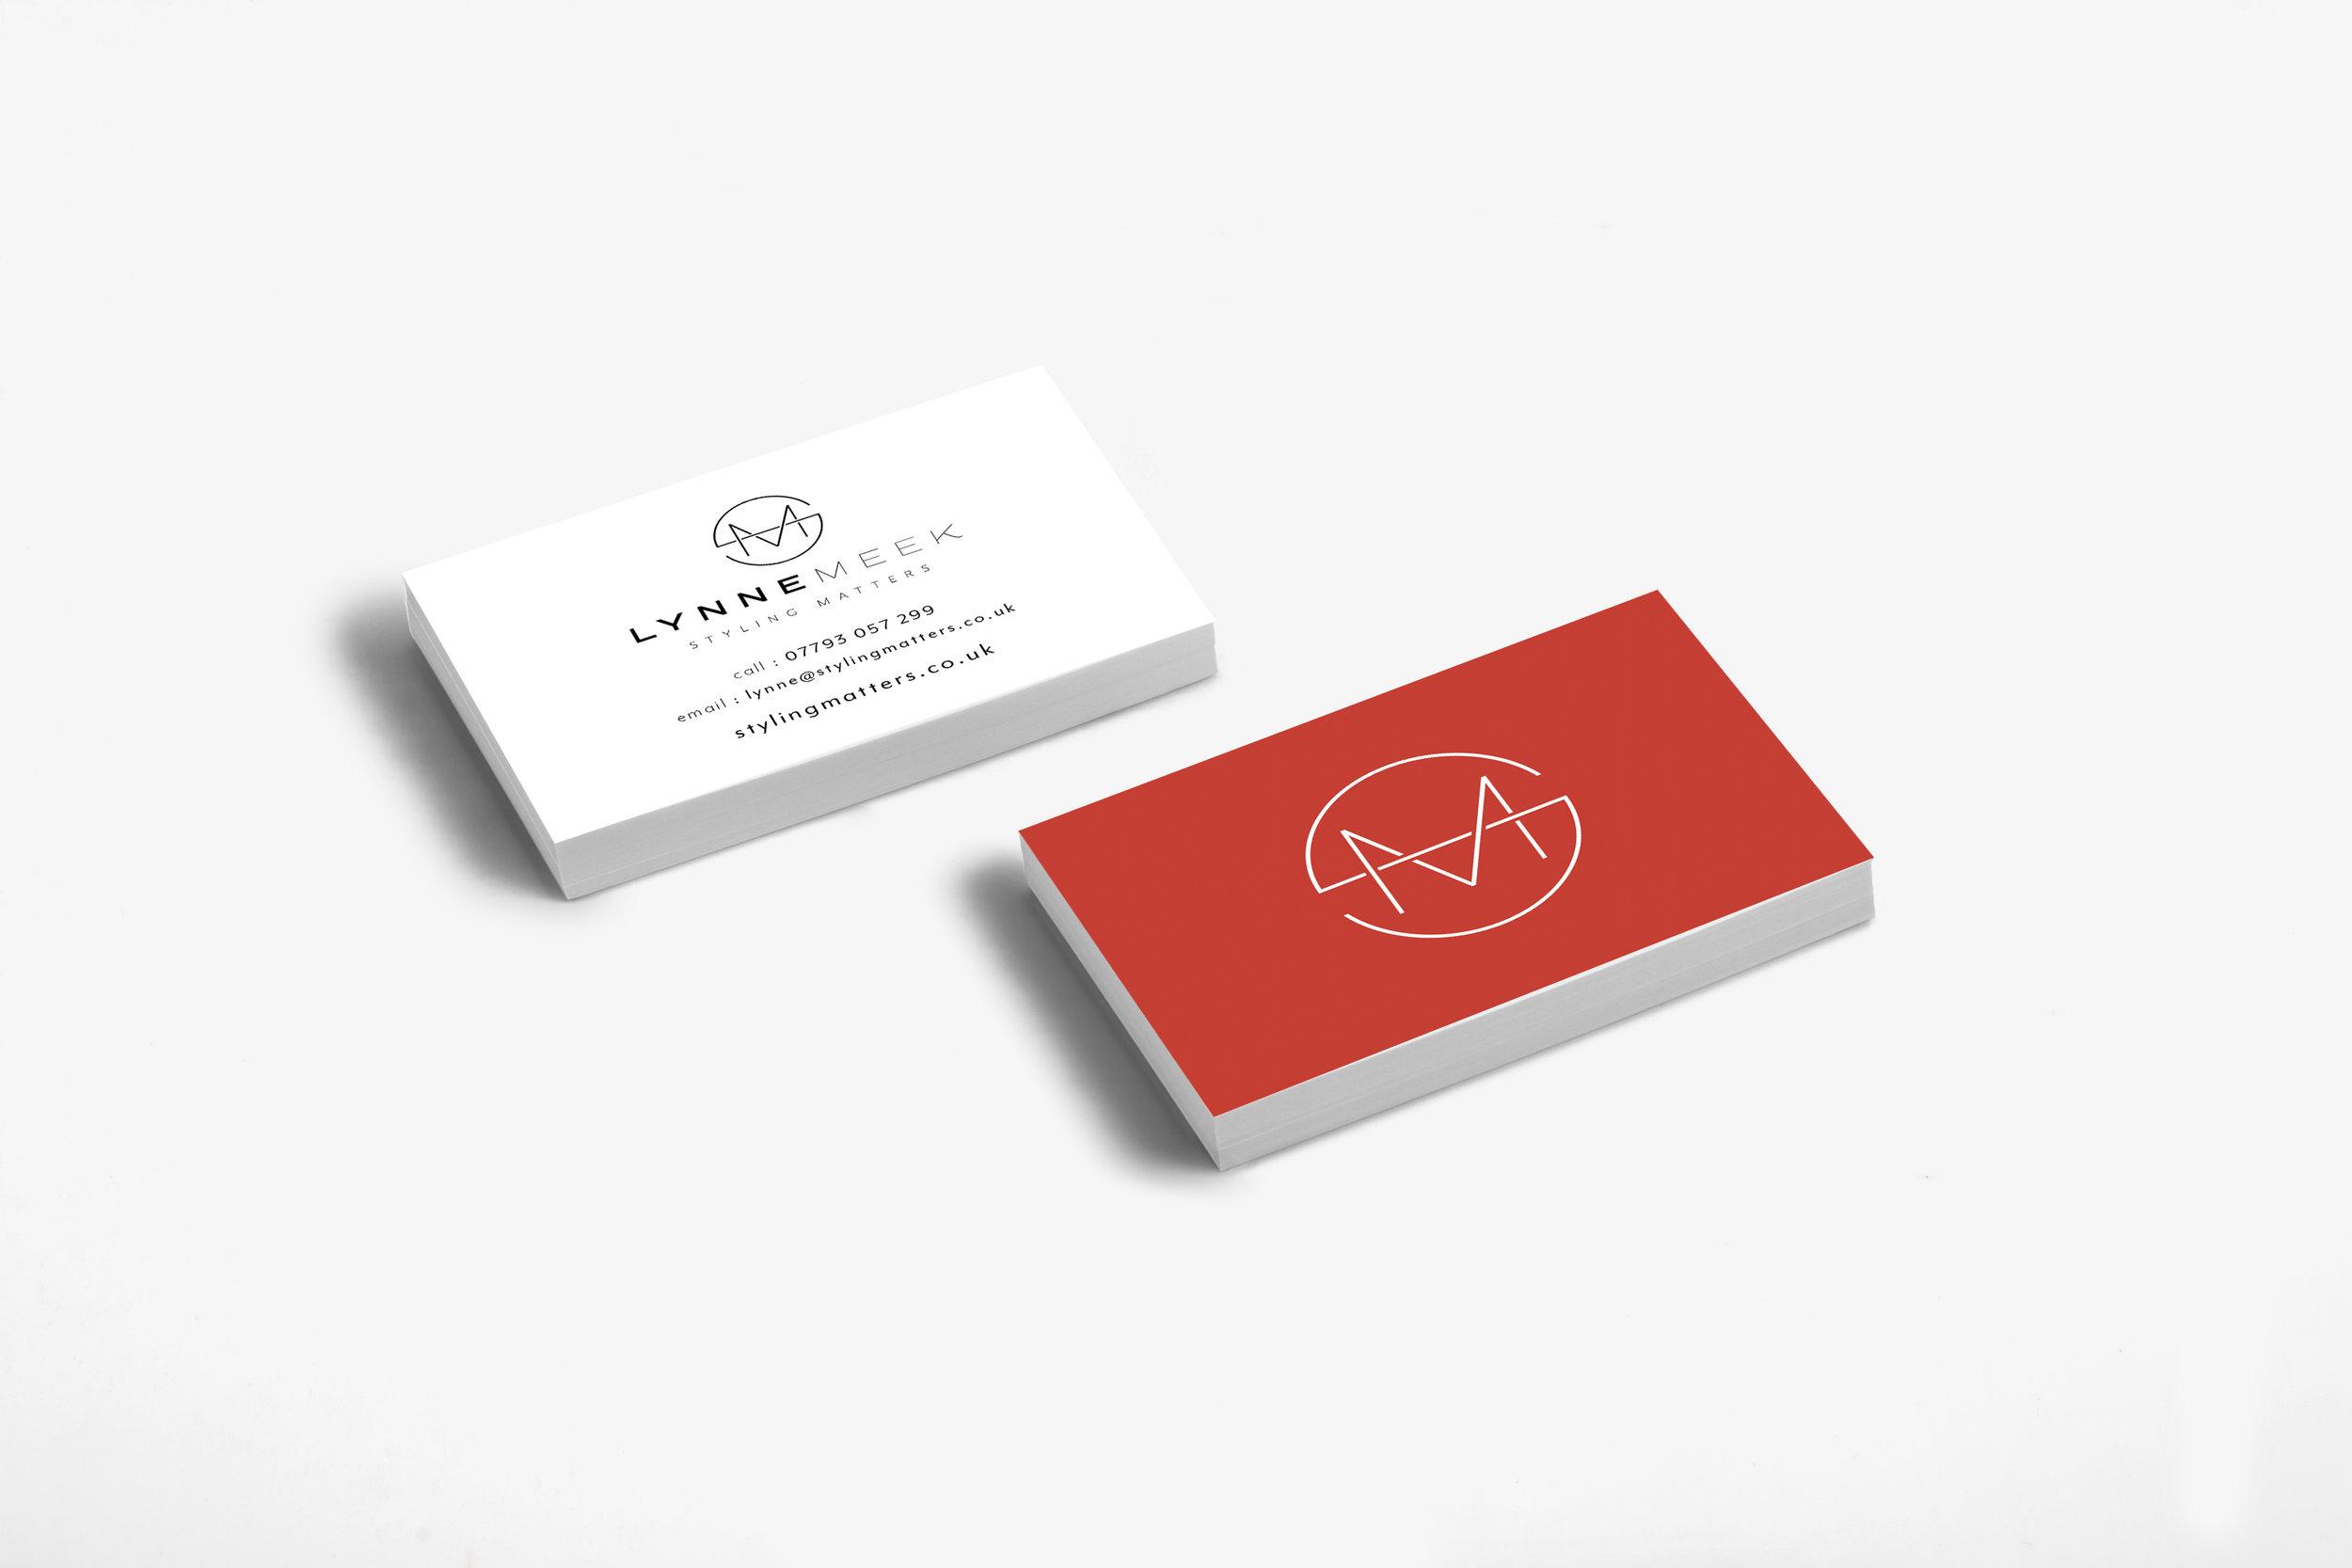 Business stationery design for Lynne Meek, Styling Matters, Tunbridge Wells business